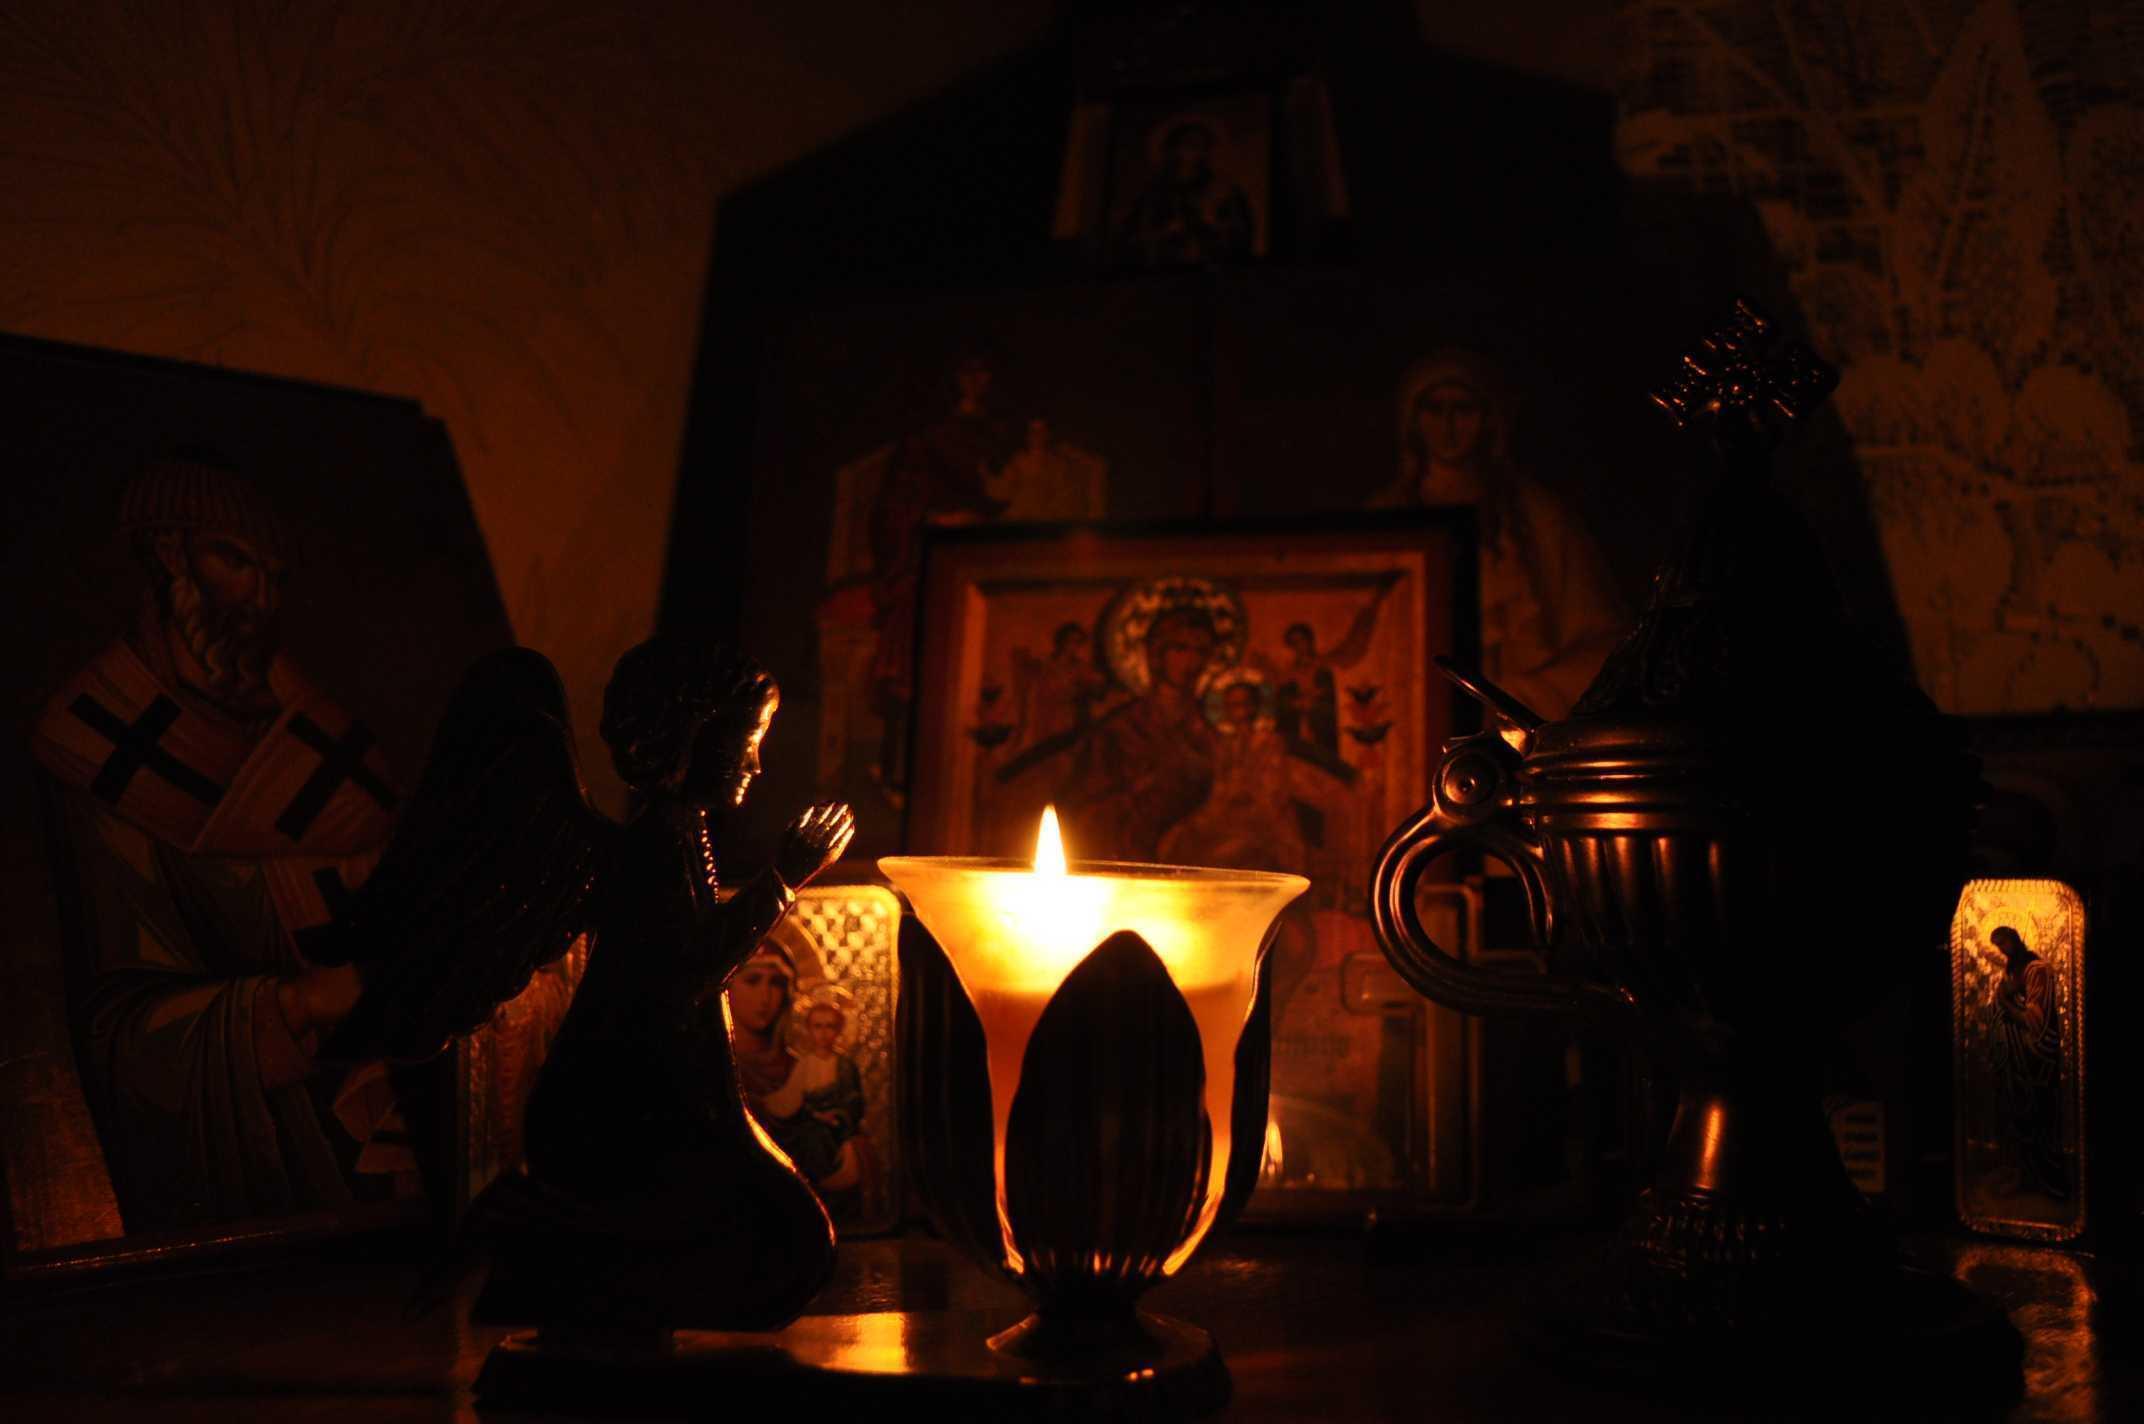 PARINTELE STANILOAE despre ORTODOXIE versus catolicism si protestantism: <i>&#8220;Biserica Ortodoxa n-a stirbit adevarul coborat de sus, n-a diluat vinul ceresc cu apa sfatoseniilor omenesti&#8221;</i>